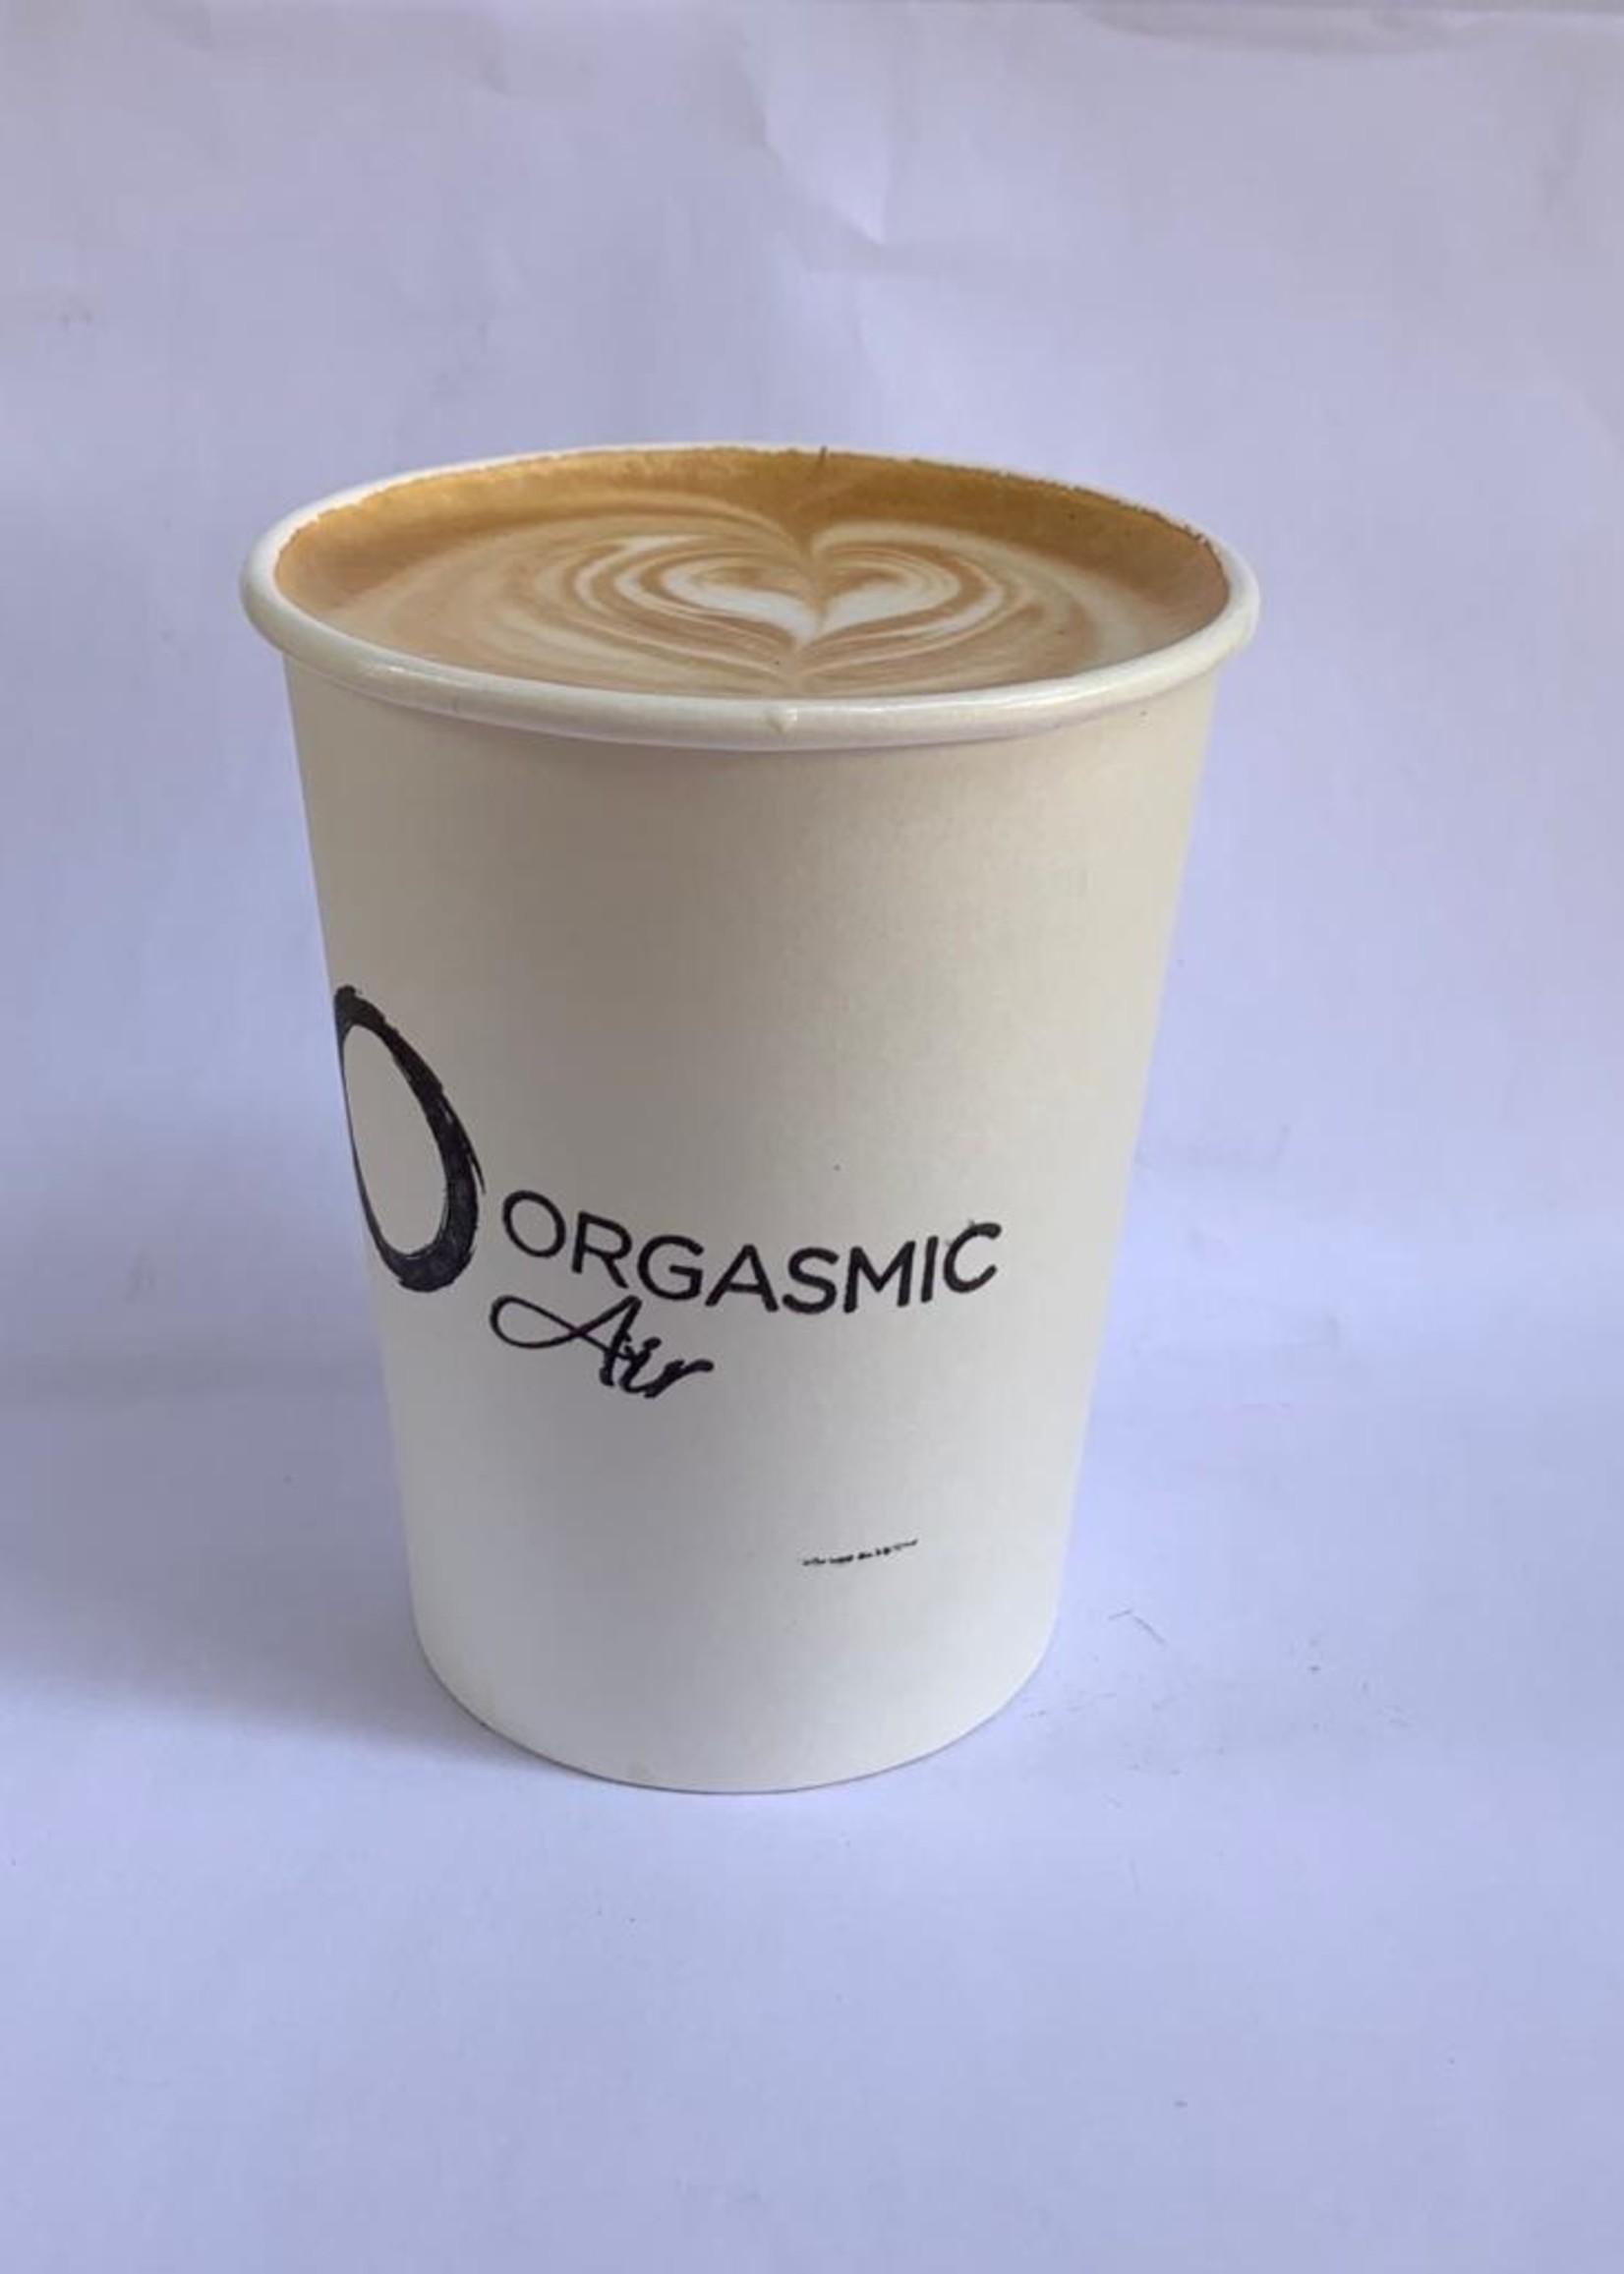 Organic & Air Hazelnut cappuccino